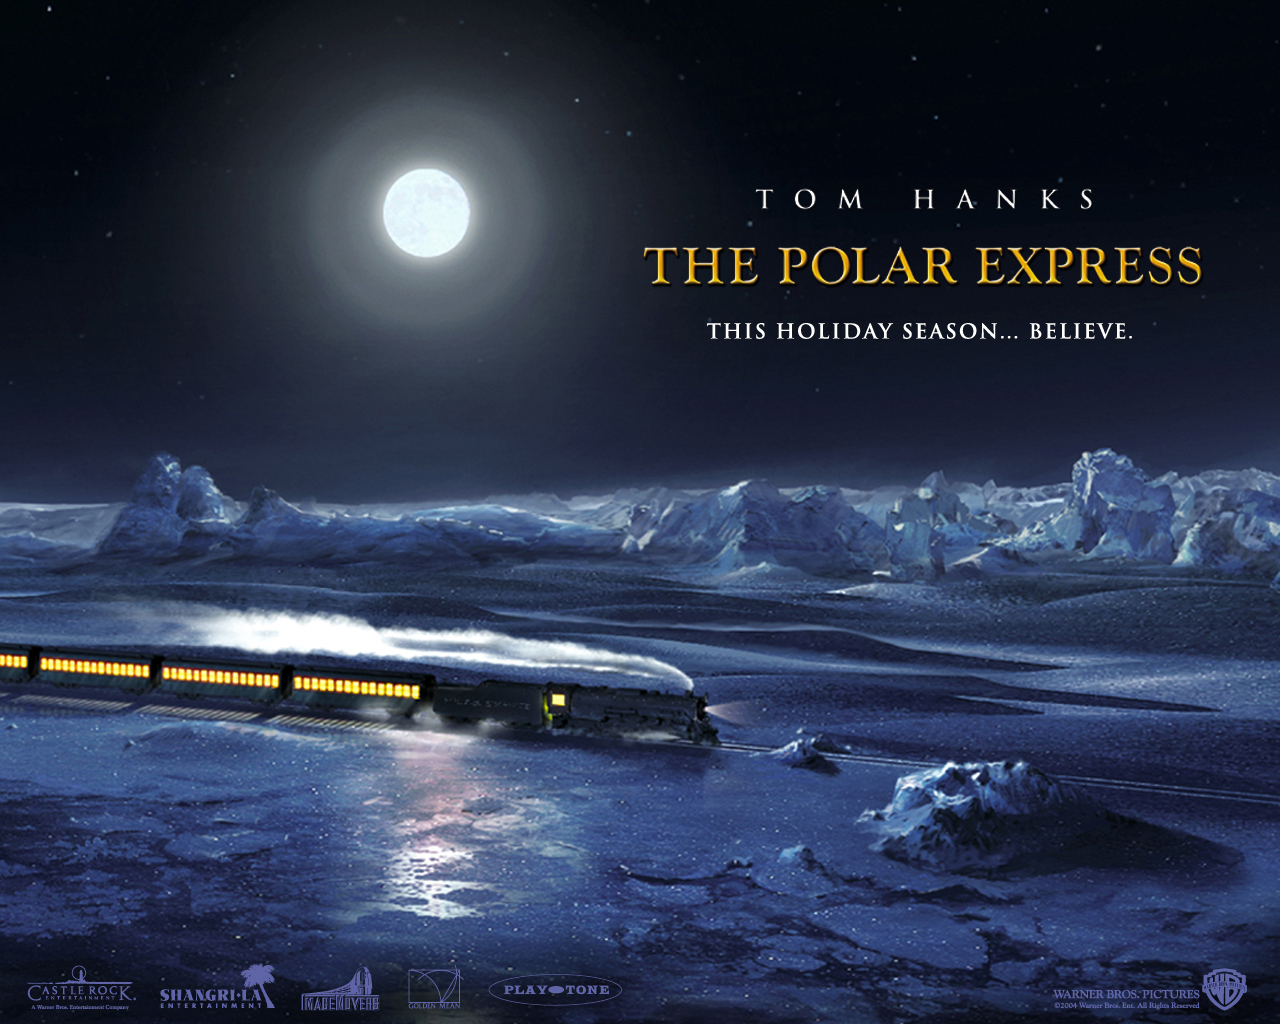 polar express_u6781u5730u7279u5feb_the polar express - Powered by Discuz!